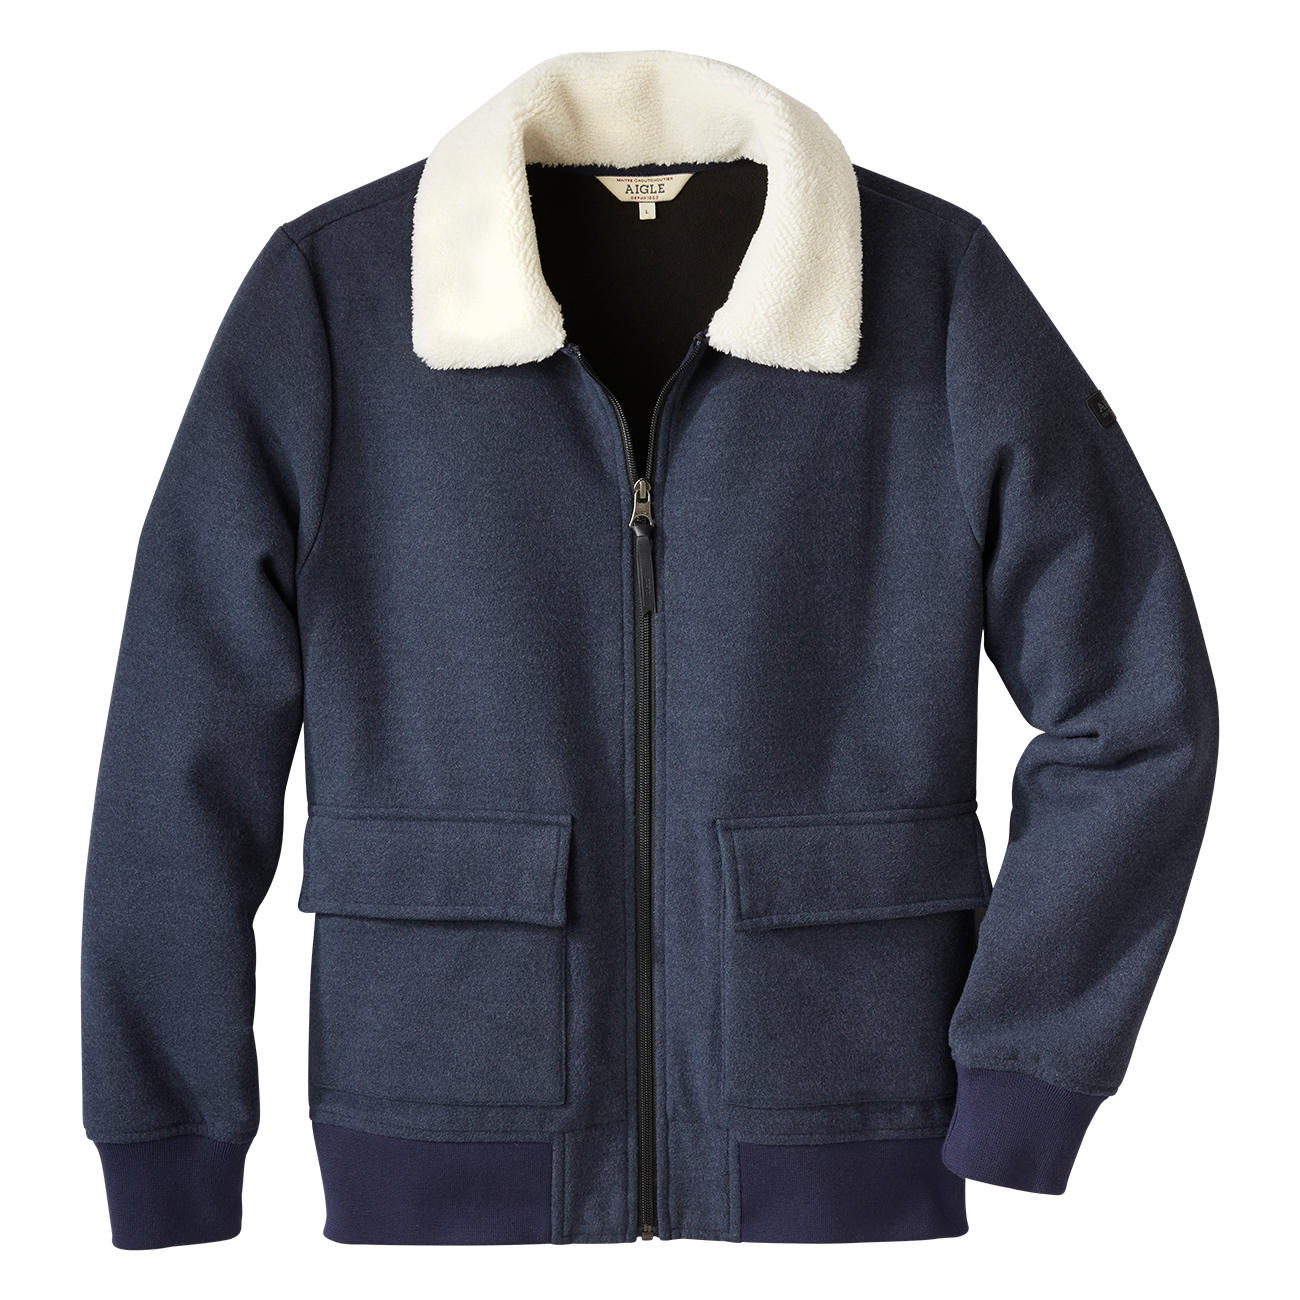 promo code 7e8b6 badb4 Aigle Men's Fleece Bomber Jacket | Discover classics